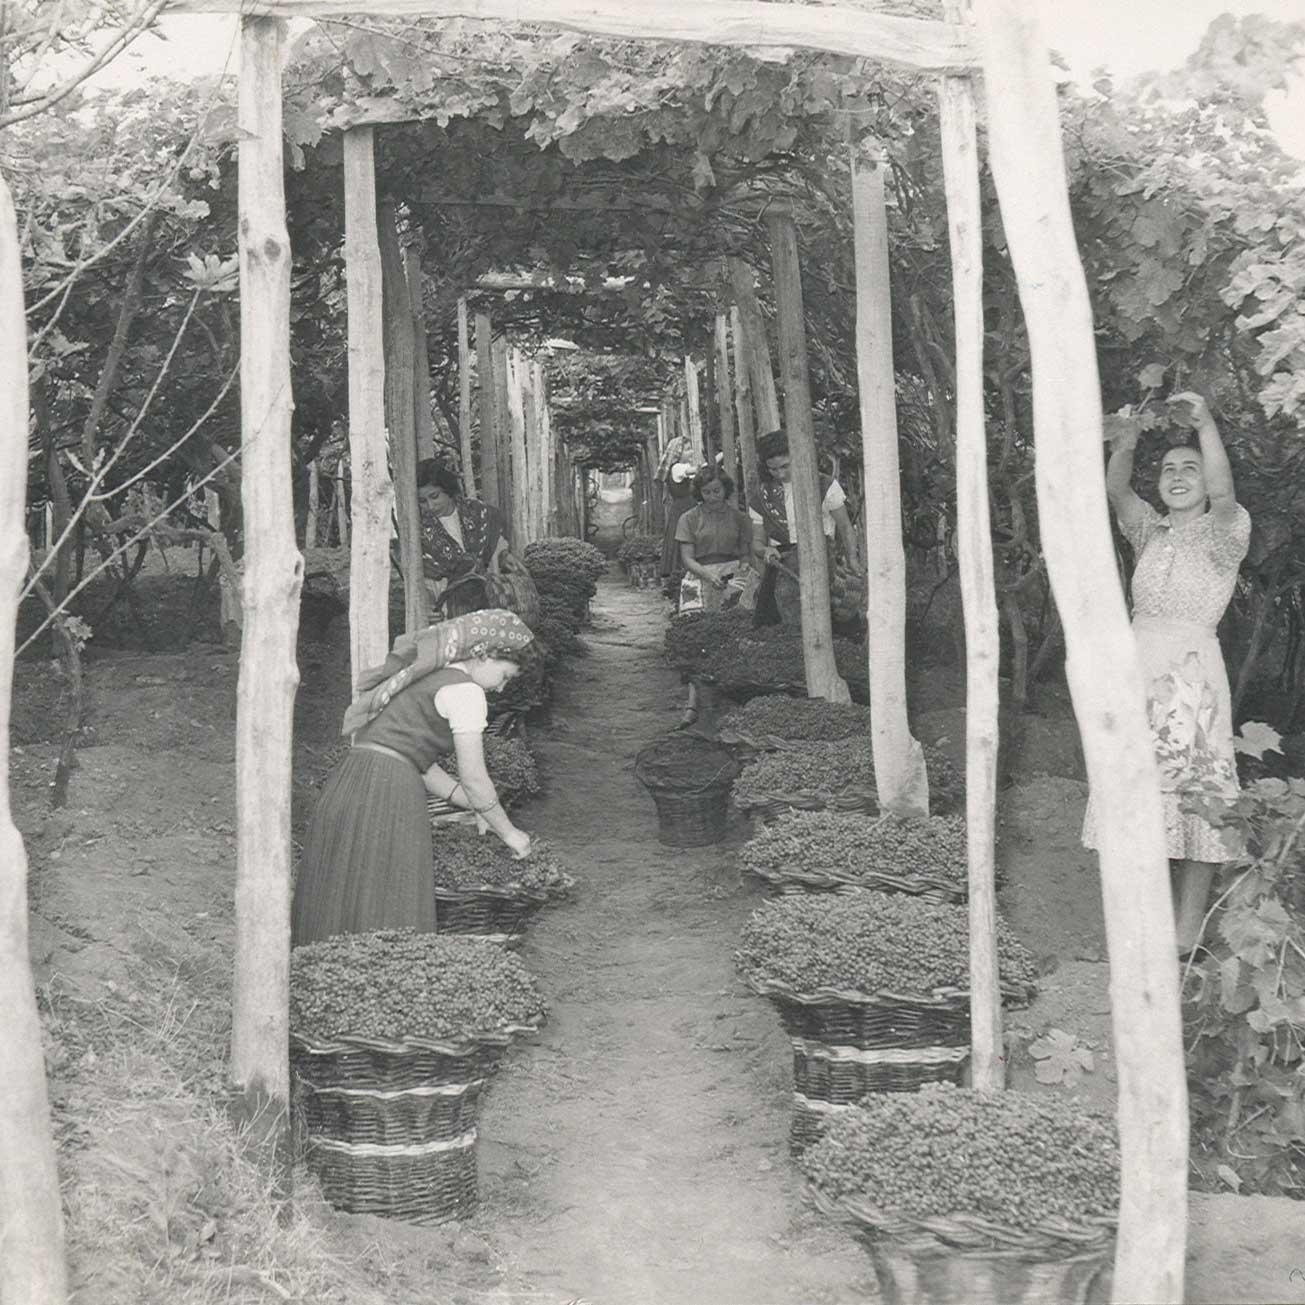 H&H Boal Madeira 1957